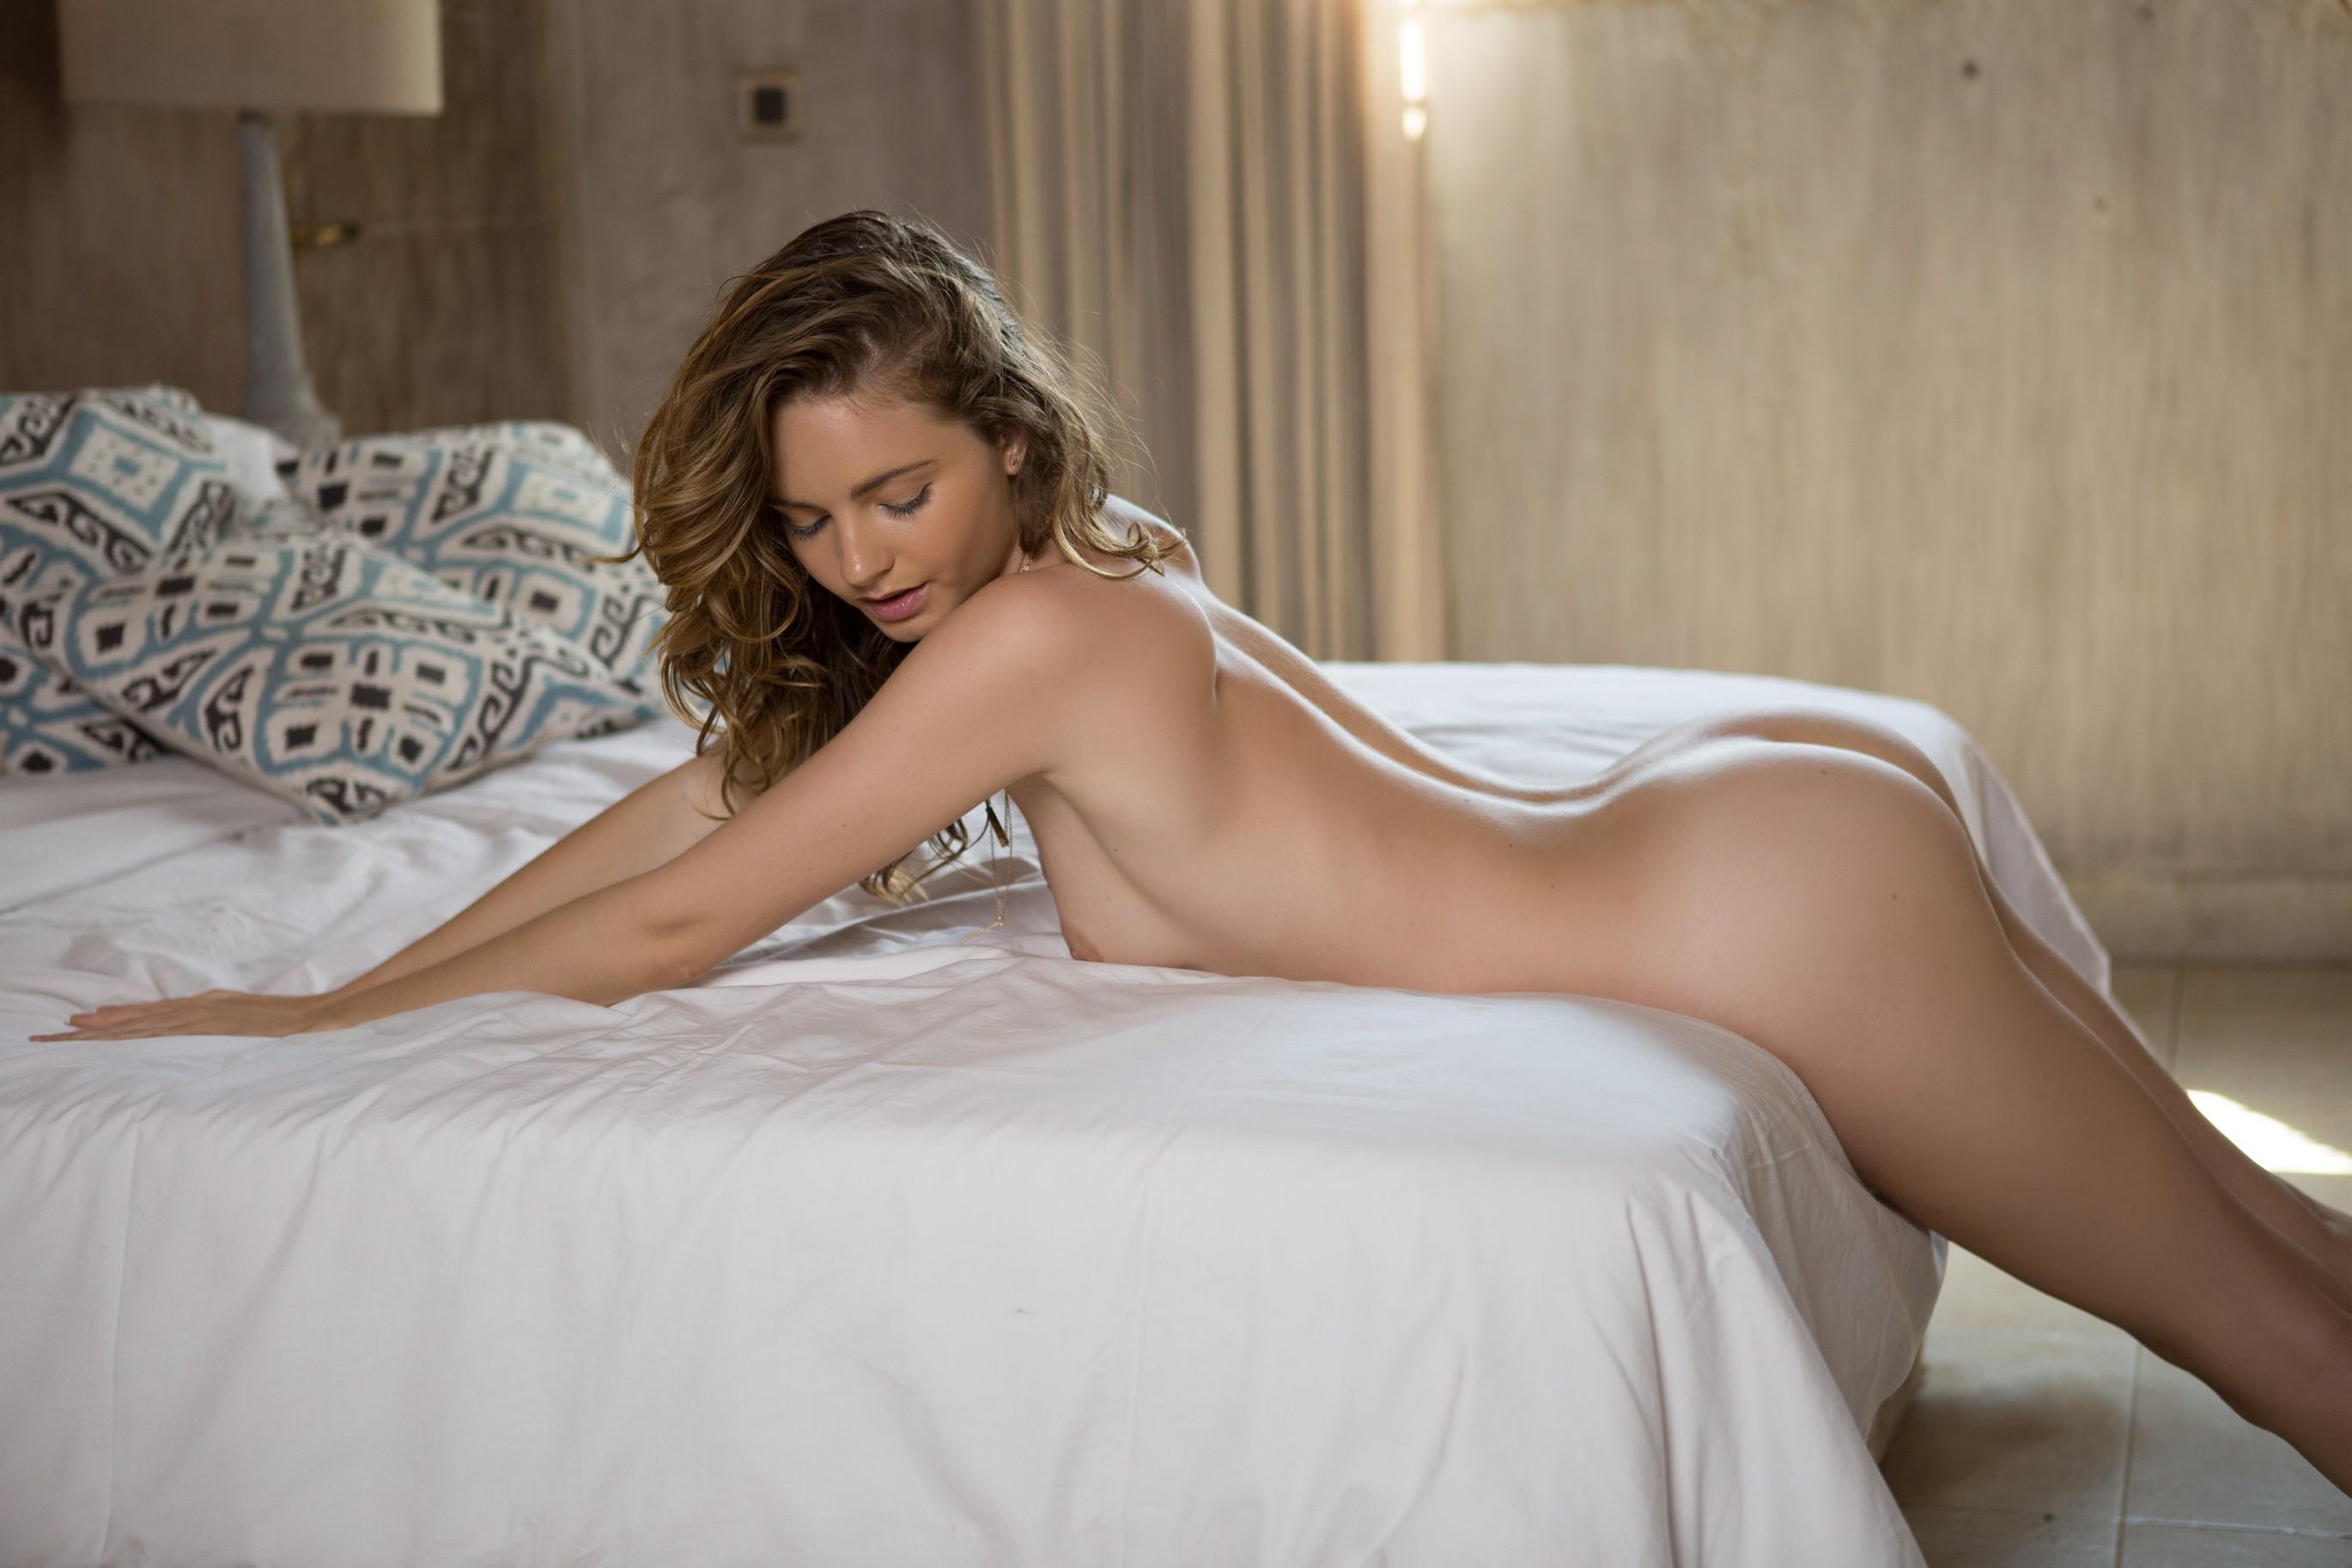 Naked on bed image fap